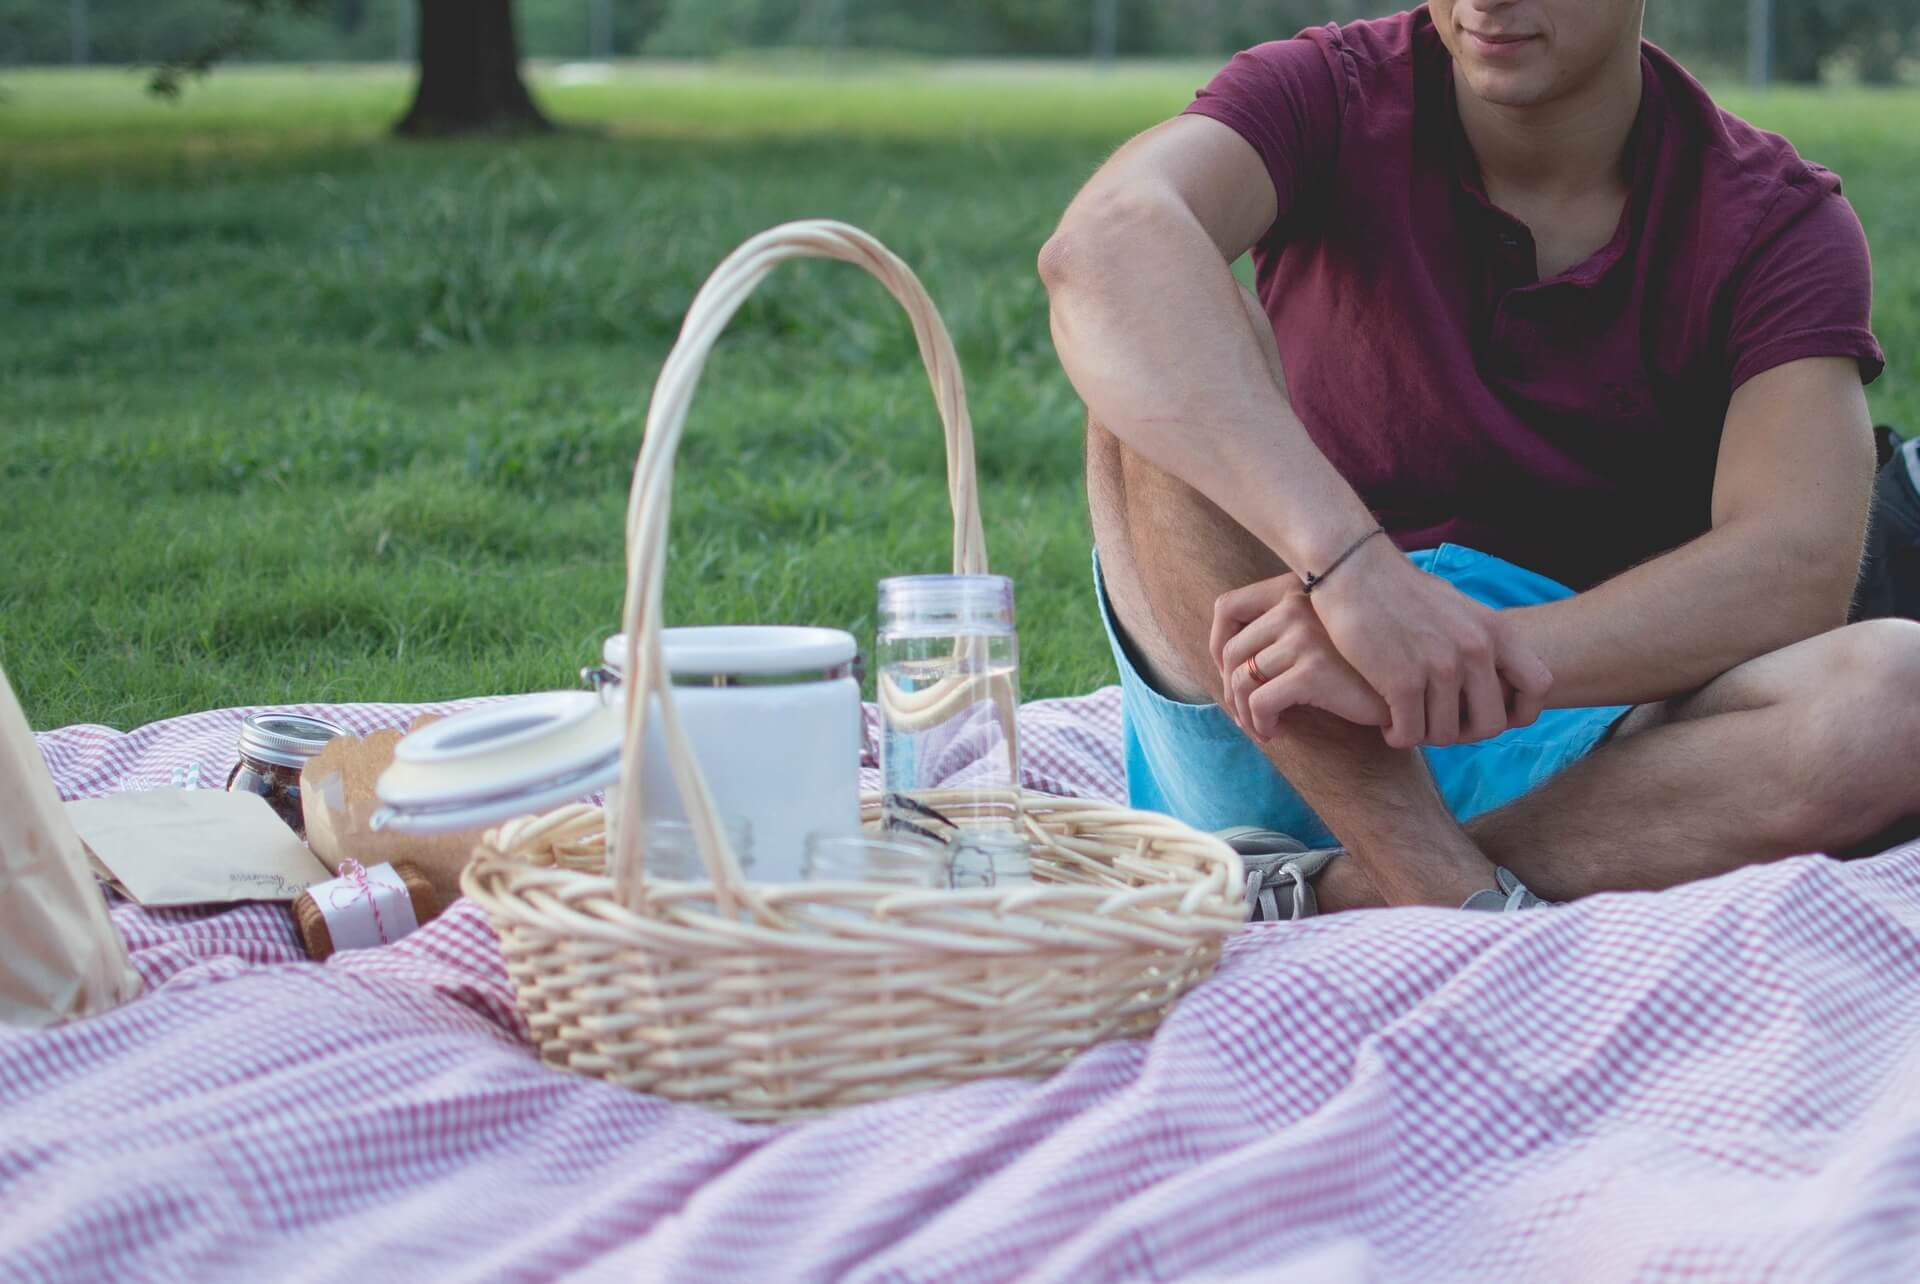 picnic-918754_1920 (1)